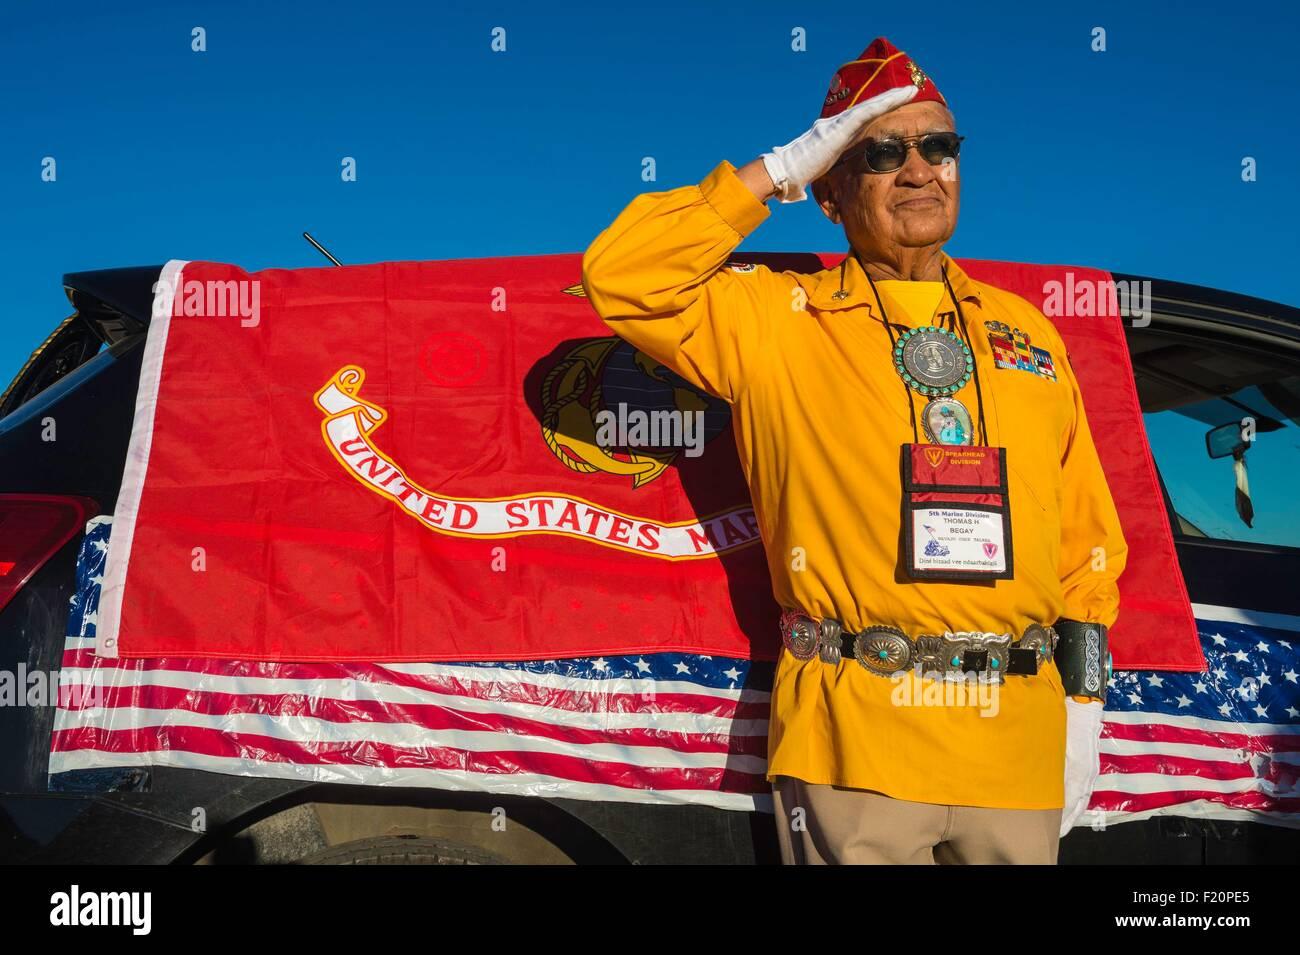 United States, Arizona, Window Rock, Festival Navajo Nation Fair, parade, Navajo code talker - Stock Image